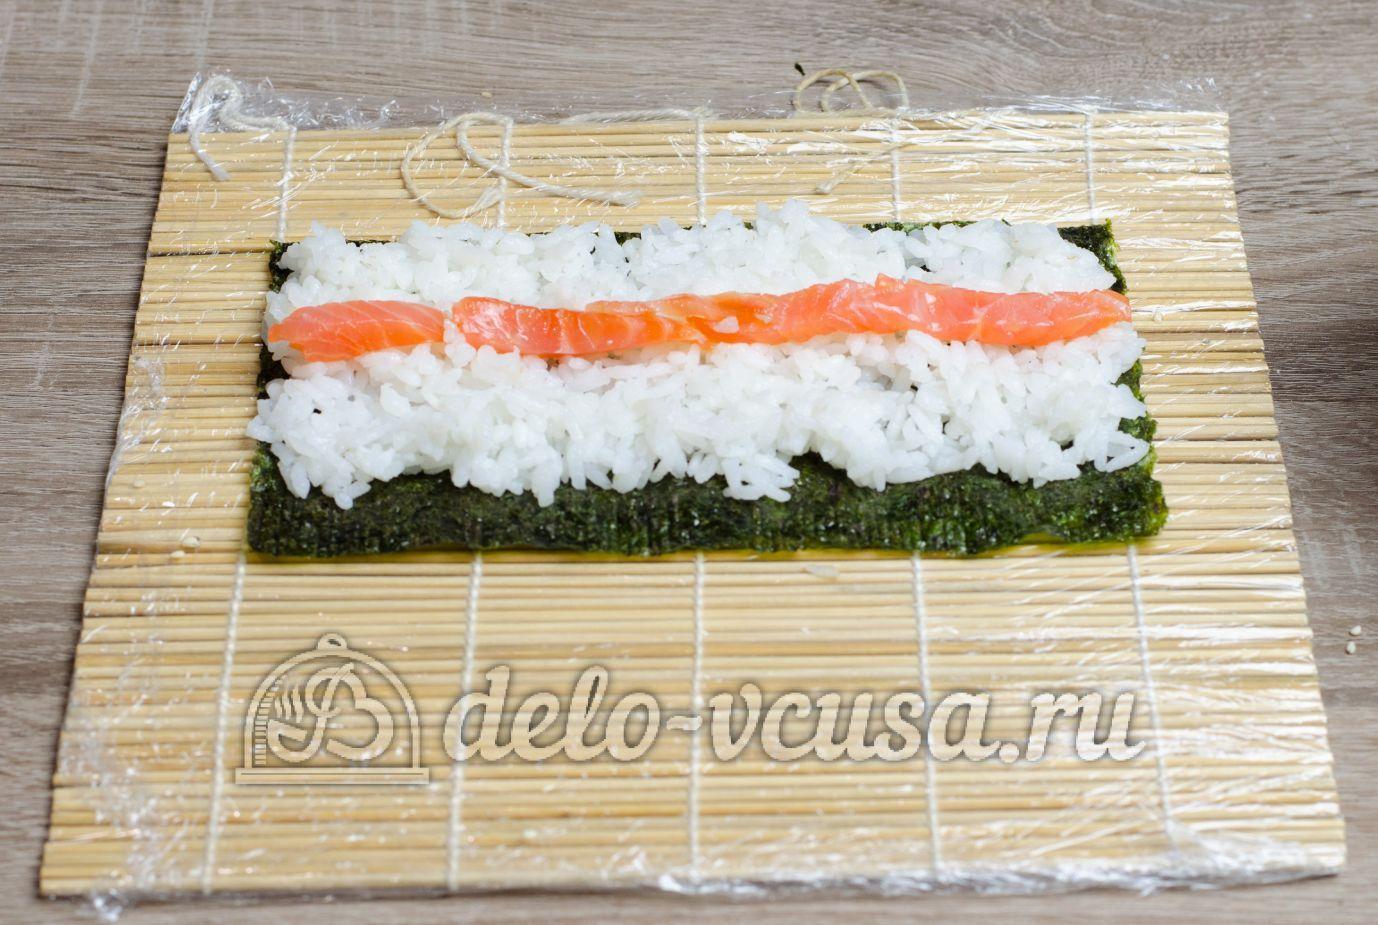 Суши торт рецепт пошагово в домашних условиях